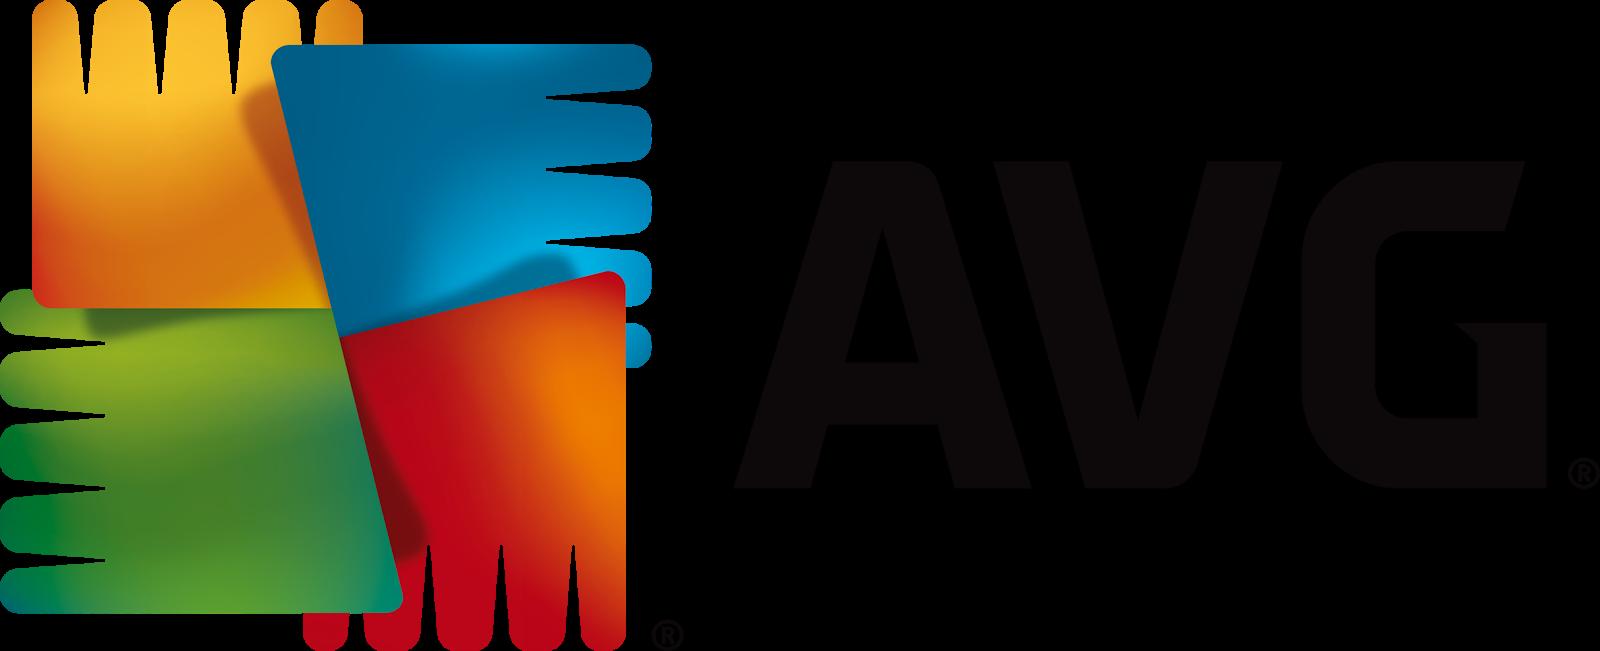 avg free windows 10 64 bit download